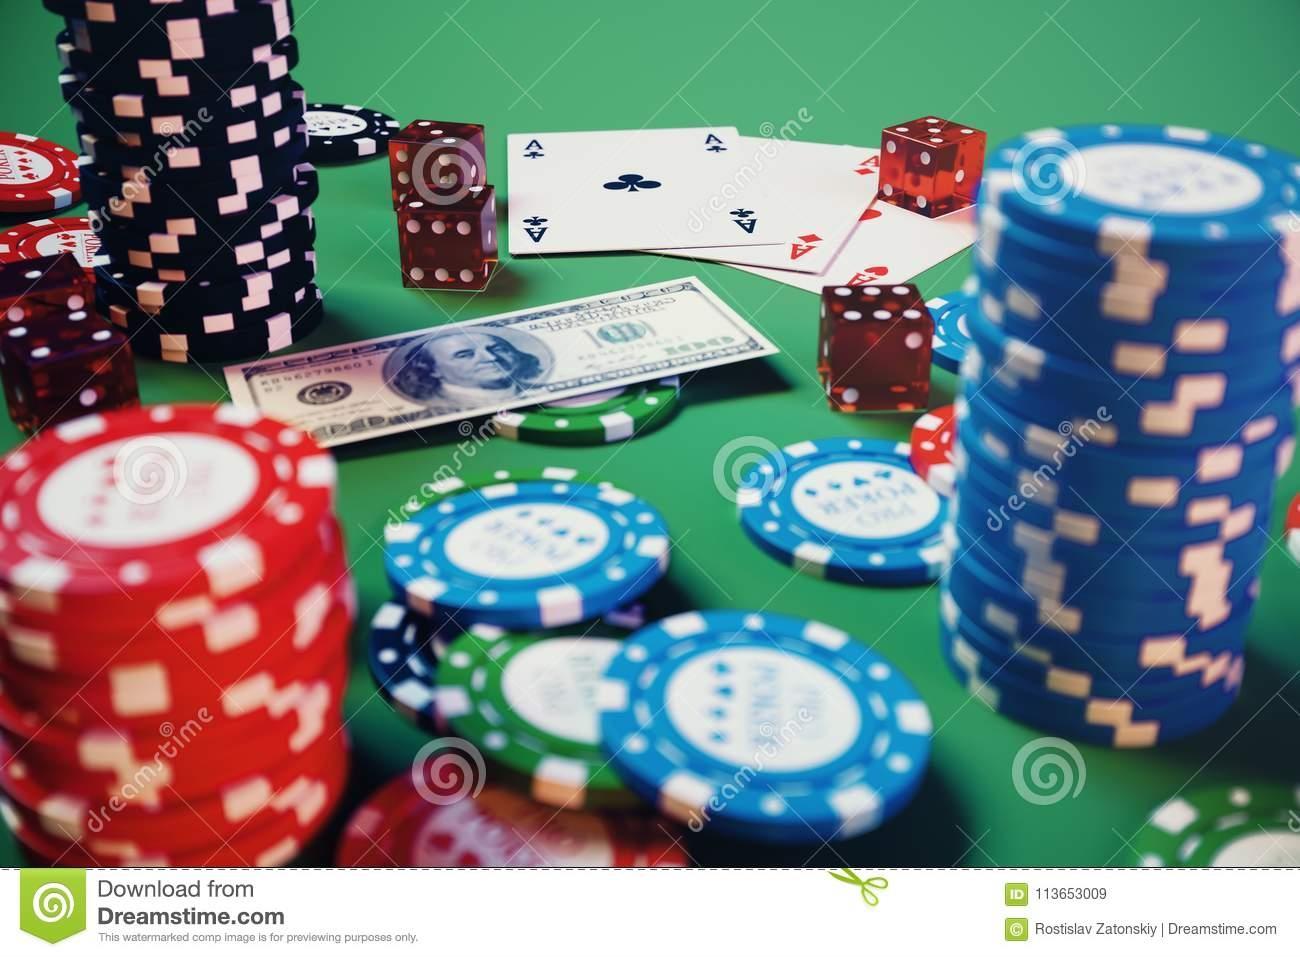 360% Match Bonus at Party Casino